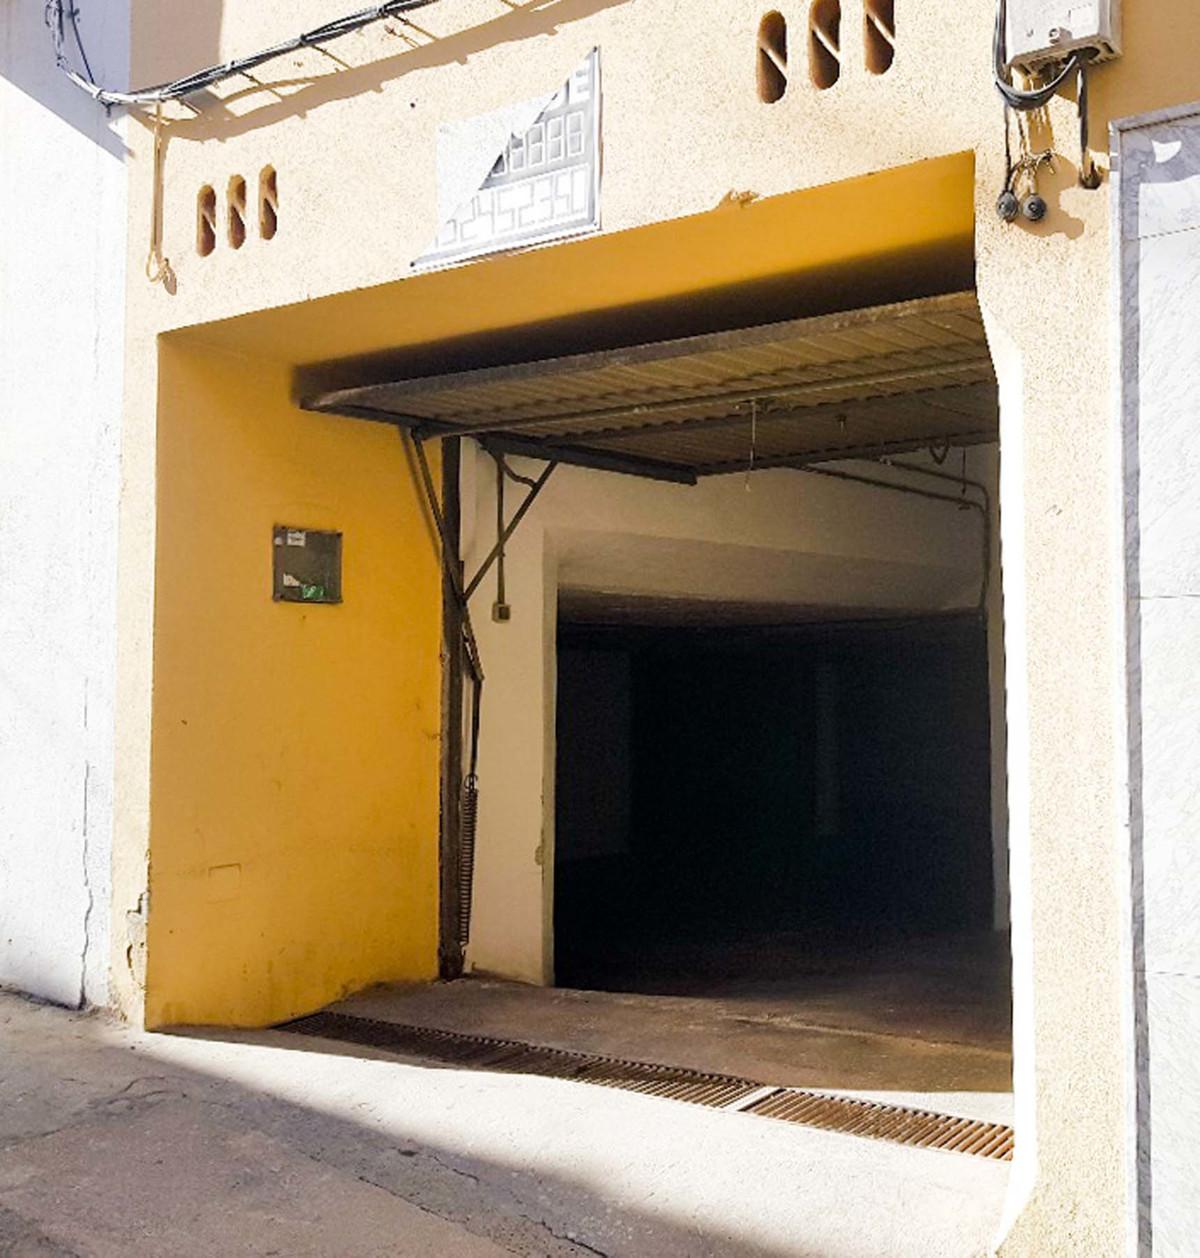 4 Bedroom Townhouse For Sale, Coín